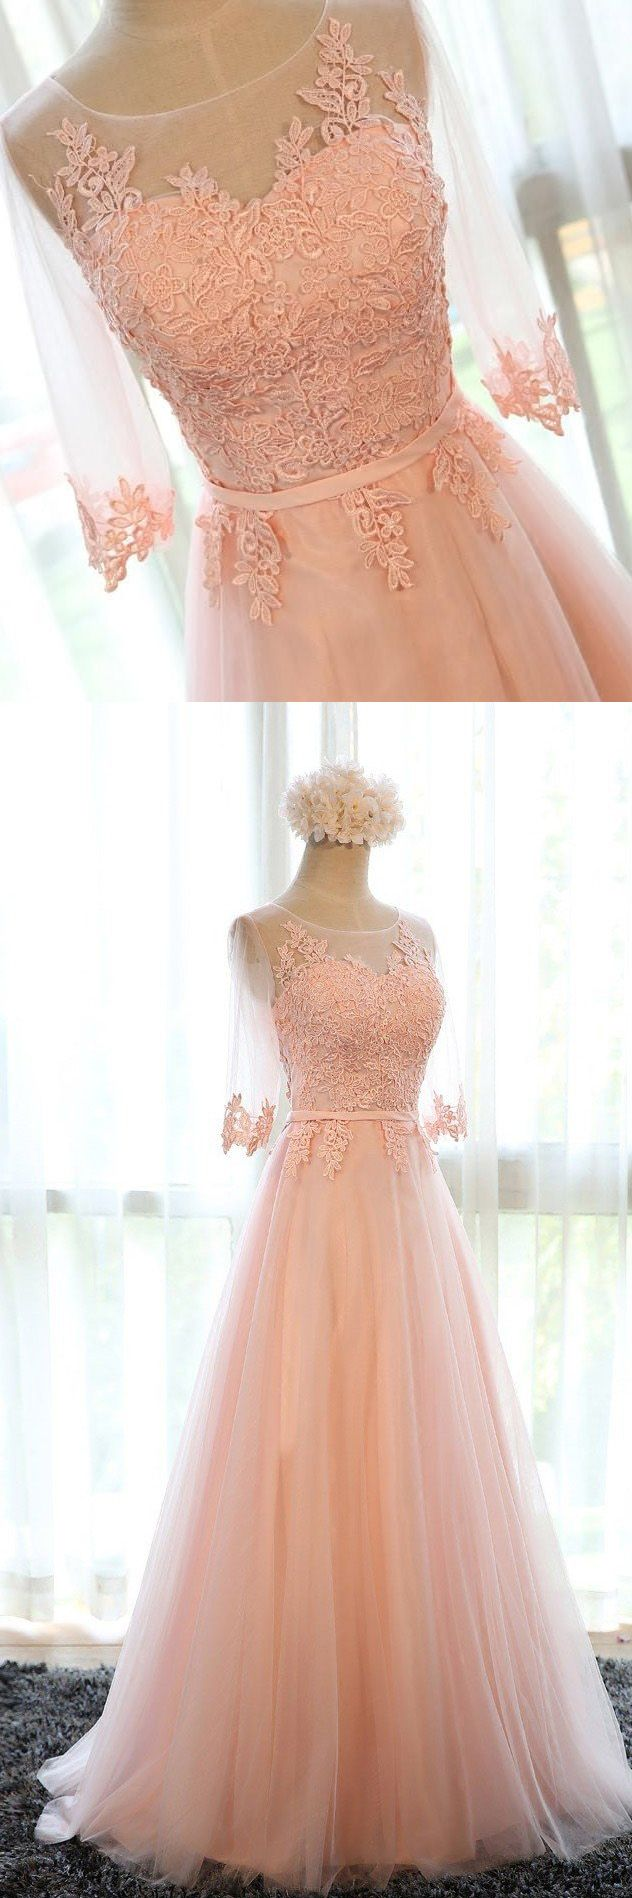 Long prom dresses lace prom dresses pink prom dresses princess